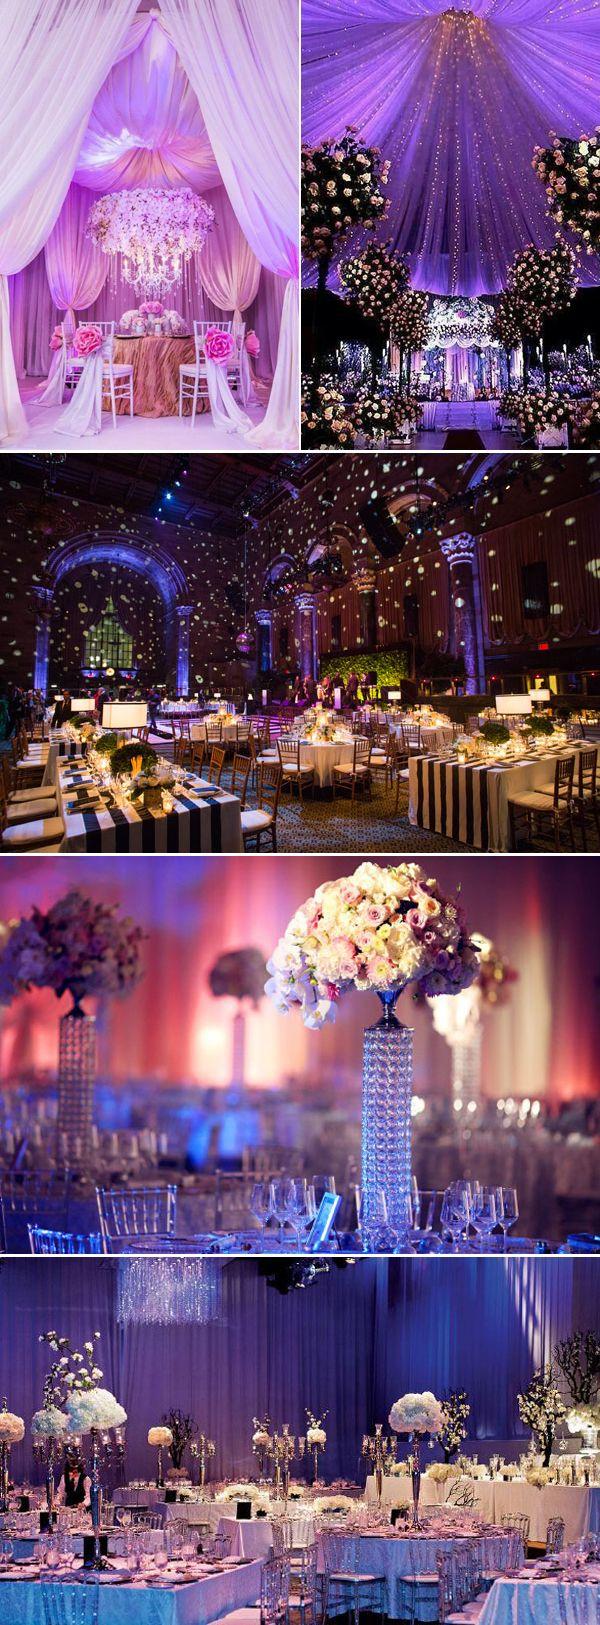 wedding reception decorations wedding decoration ideas 30 Stunning Luxury Indoor Reception Decoration Ideas You don t Want to Miss